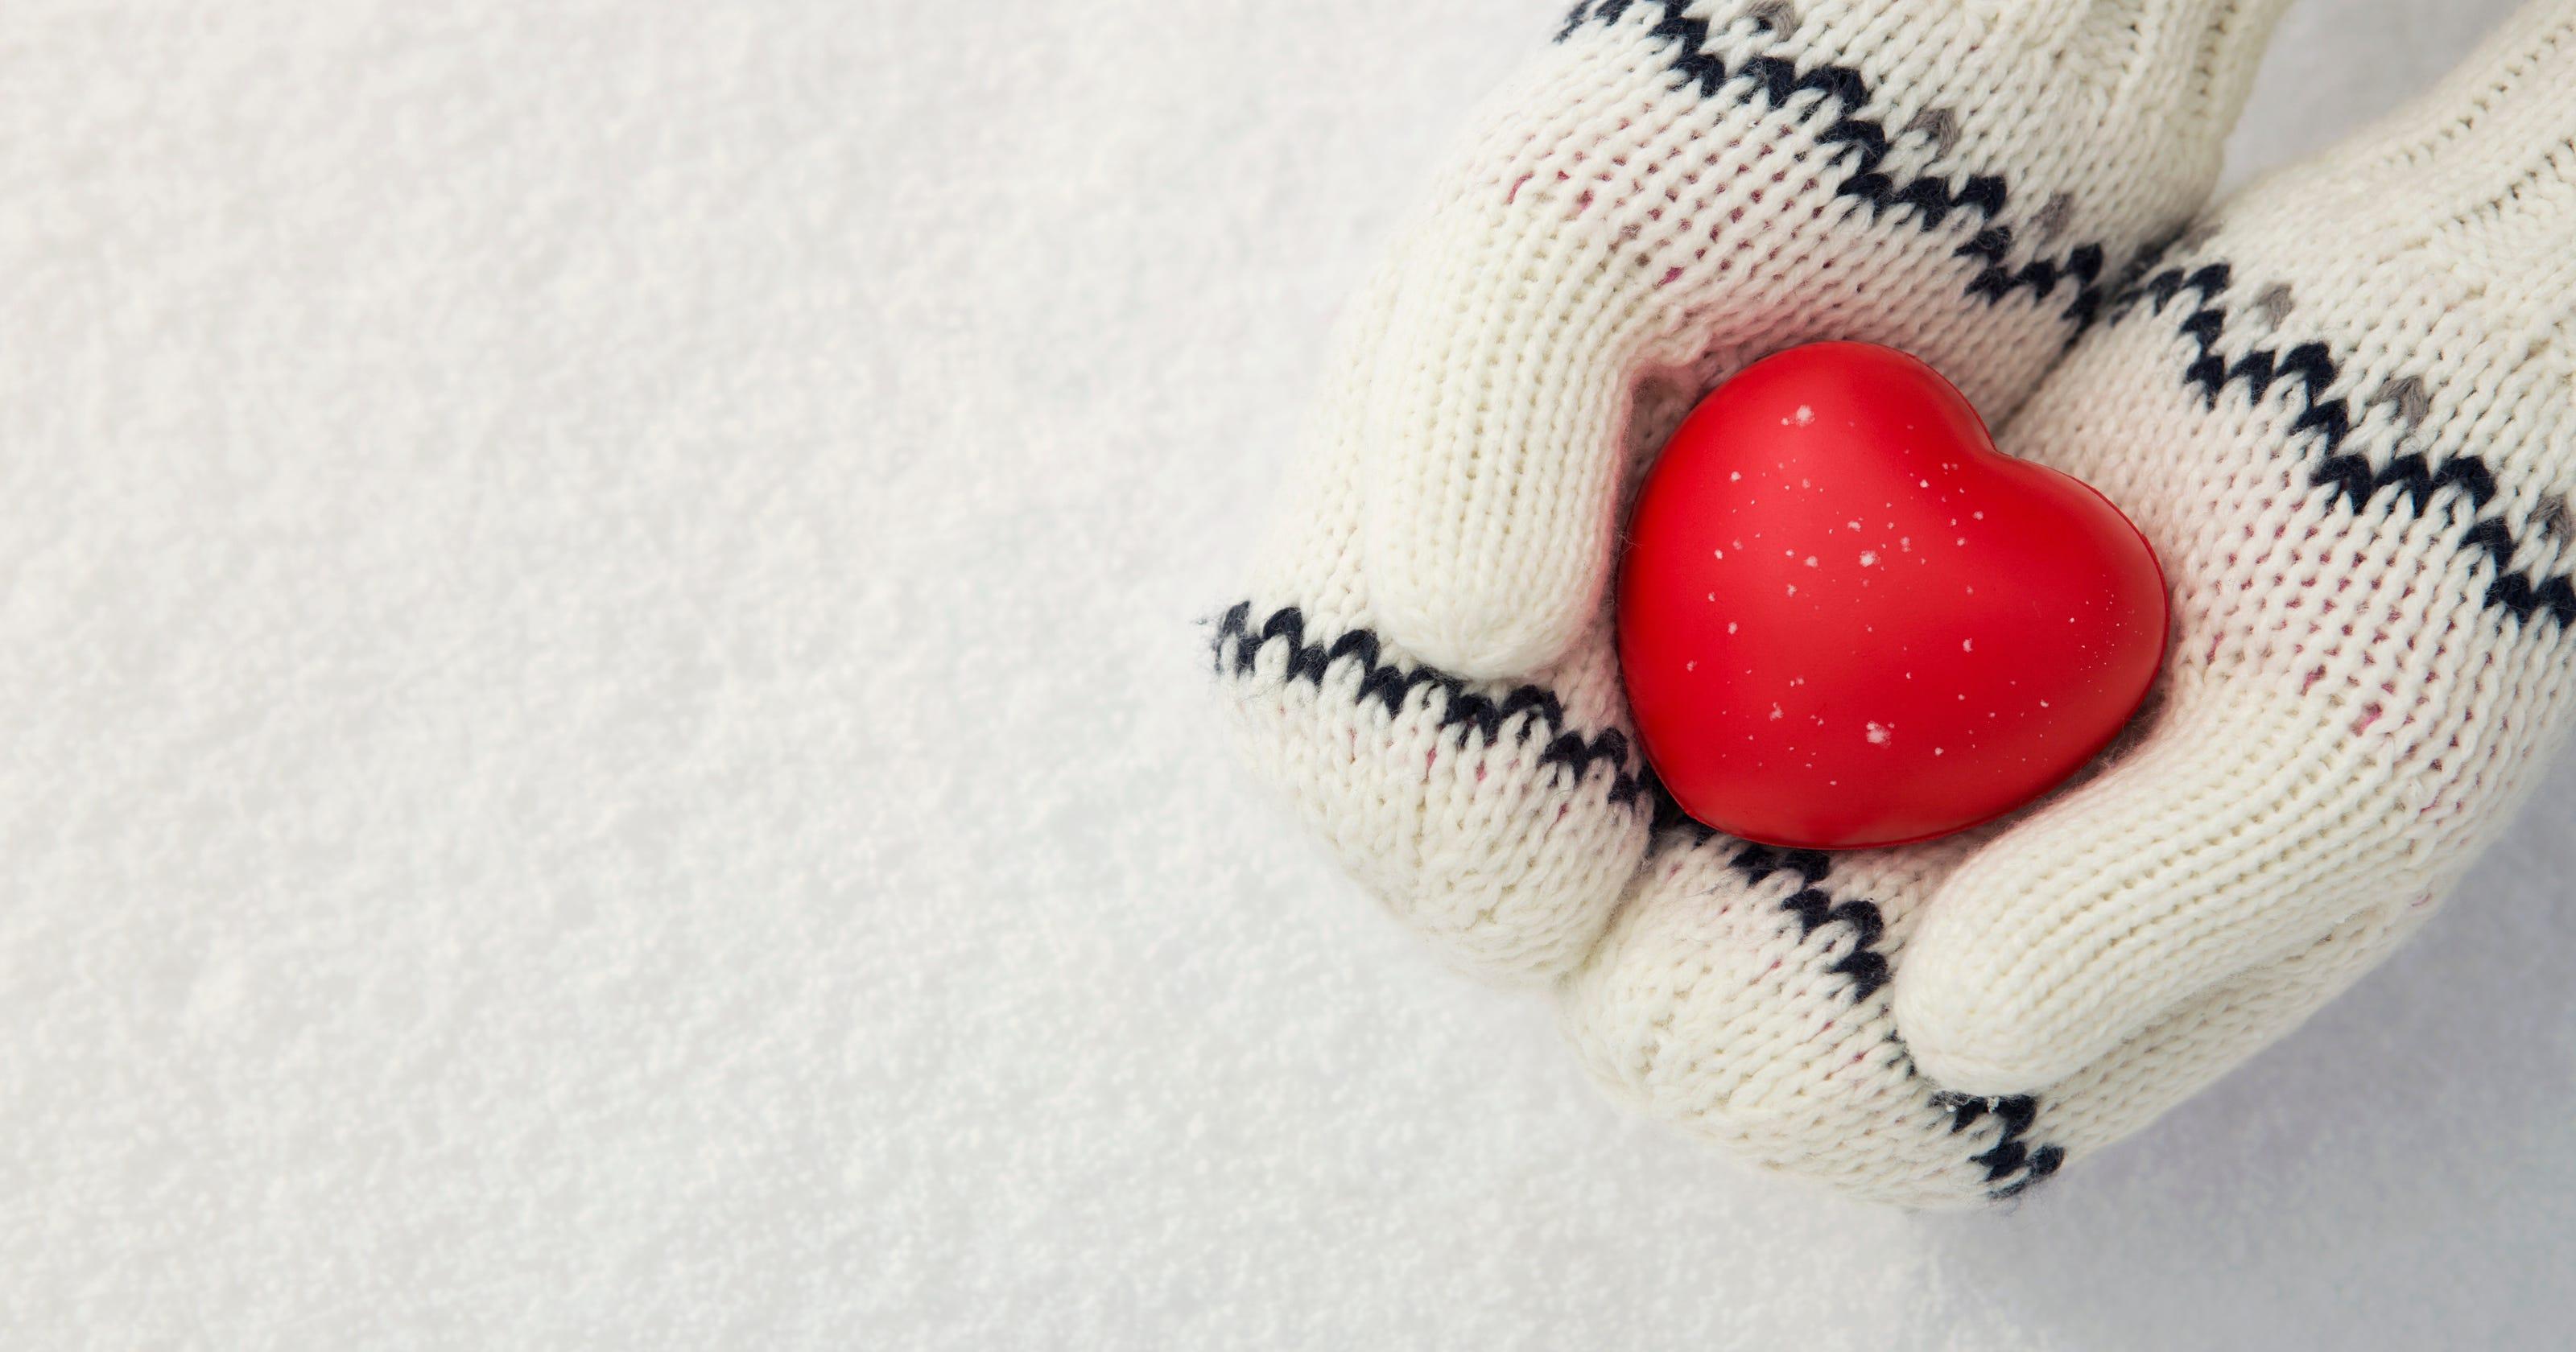 how to help san angelo charities organizations this christmas season